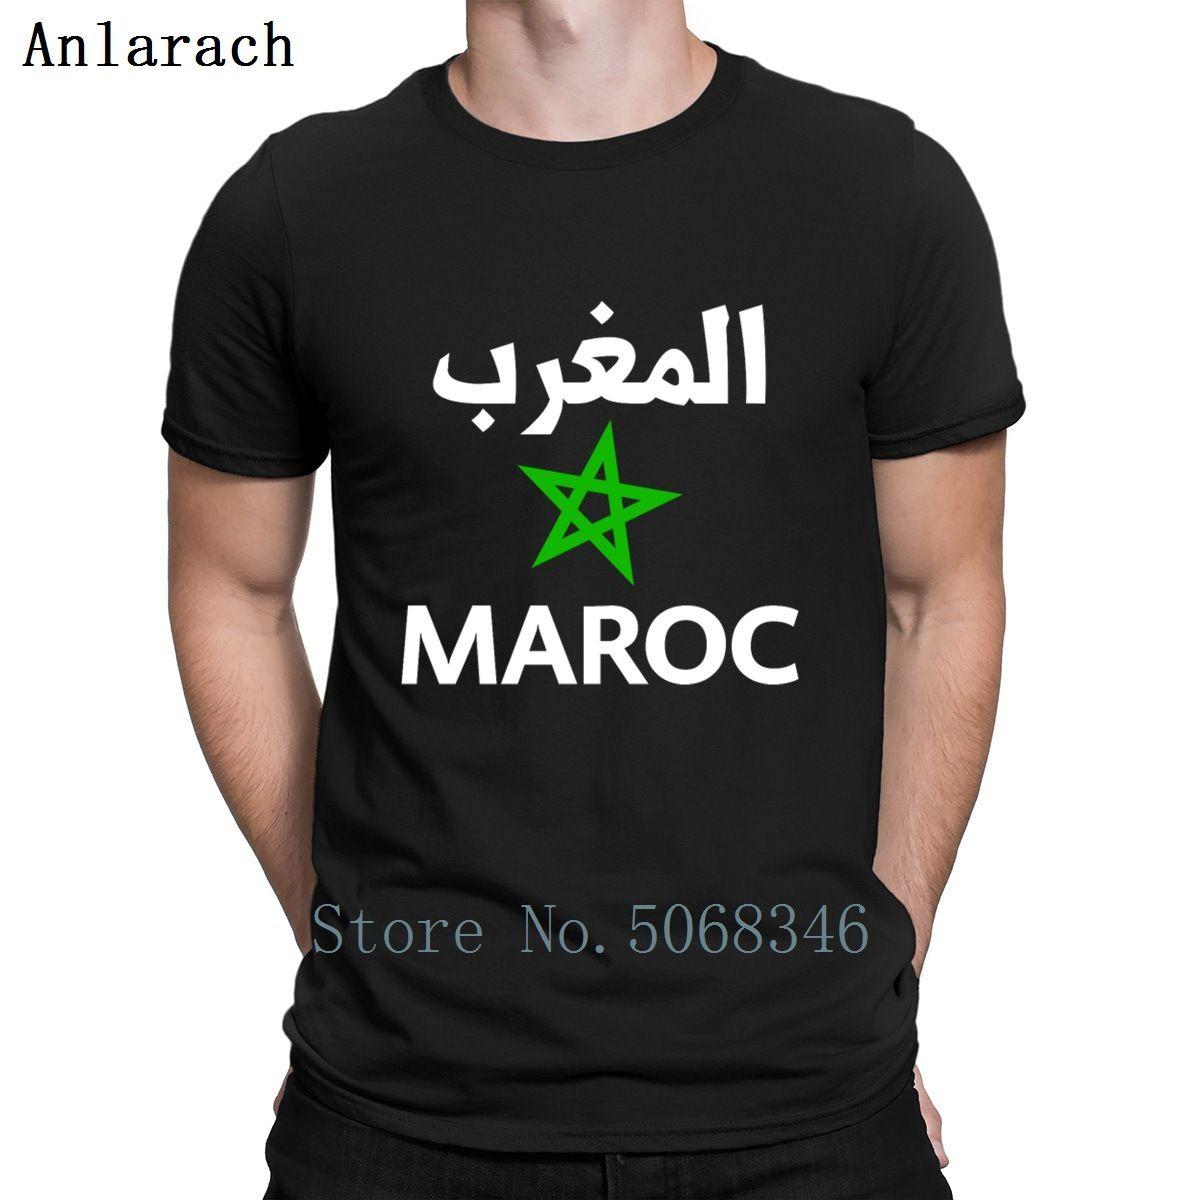 Tee Shirt Марокко Maroc Магриба Хамса Футболка Natural O шеи хлопка Одежда Смешной Designs весна осень Famous рубашка